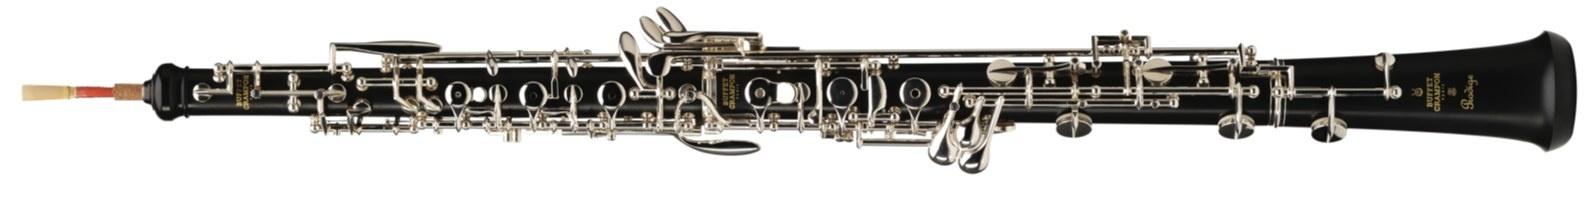 Buffet Buffet Crampon Prodige Oboe